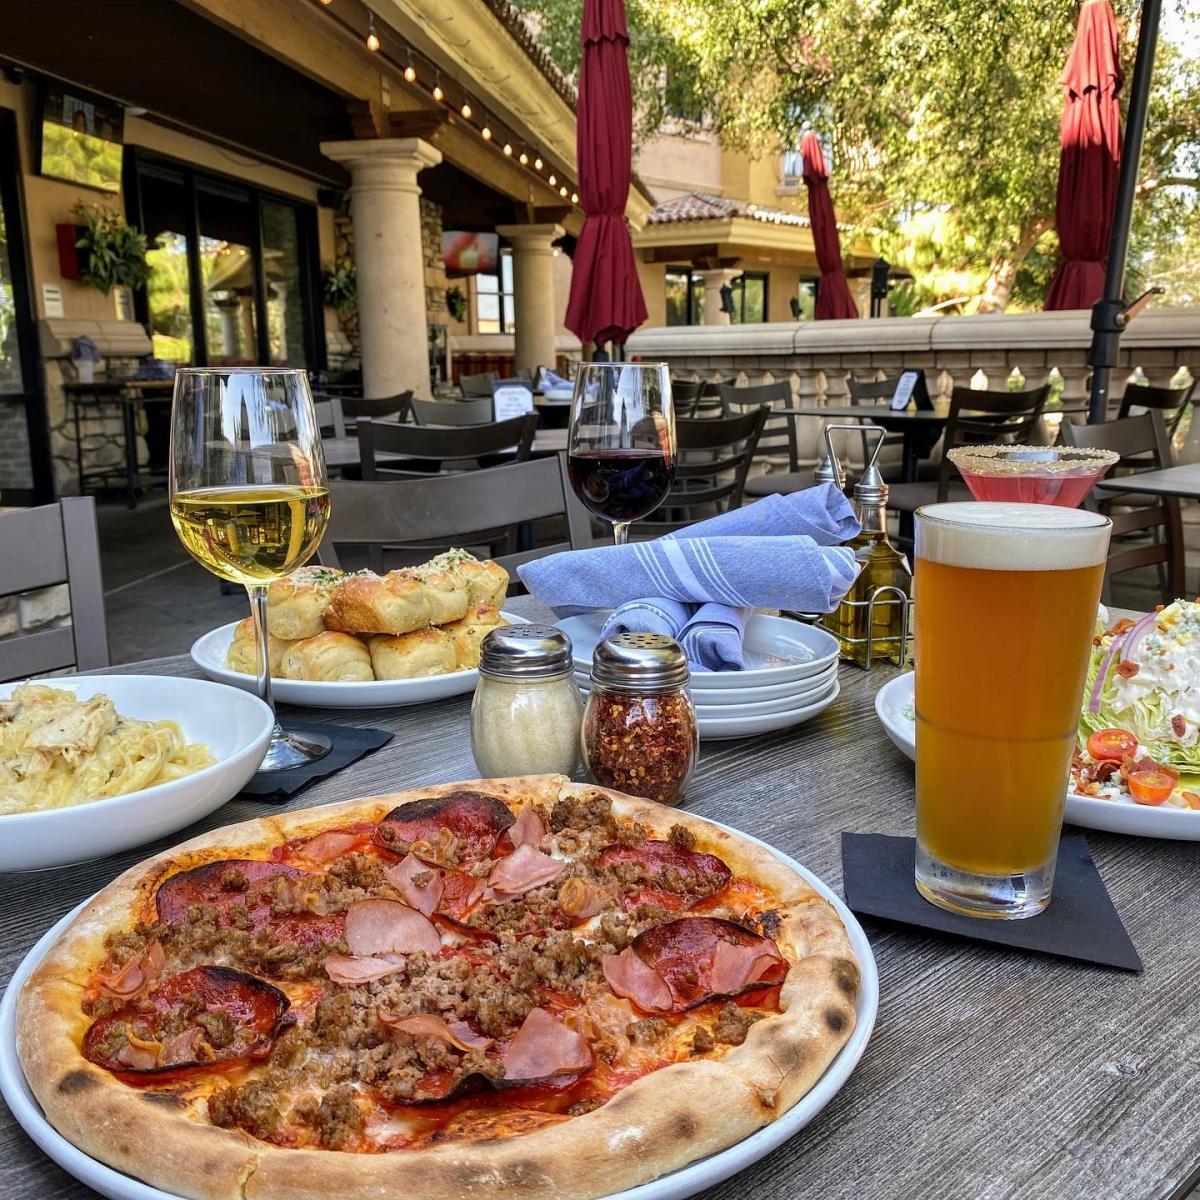 Stone + Vine Urban Italian - Outdoor Dining